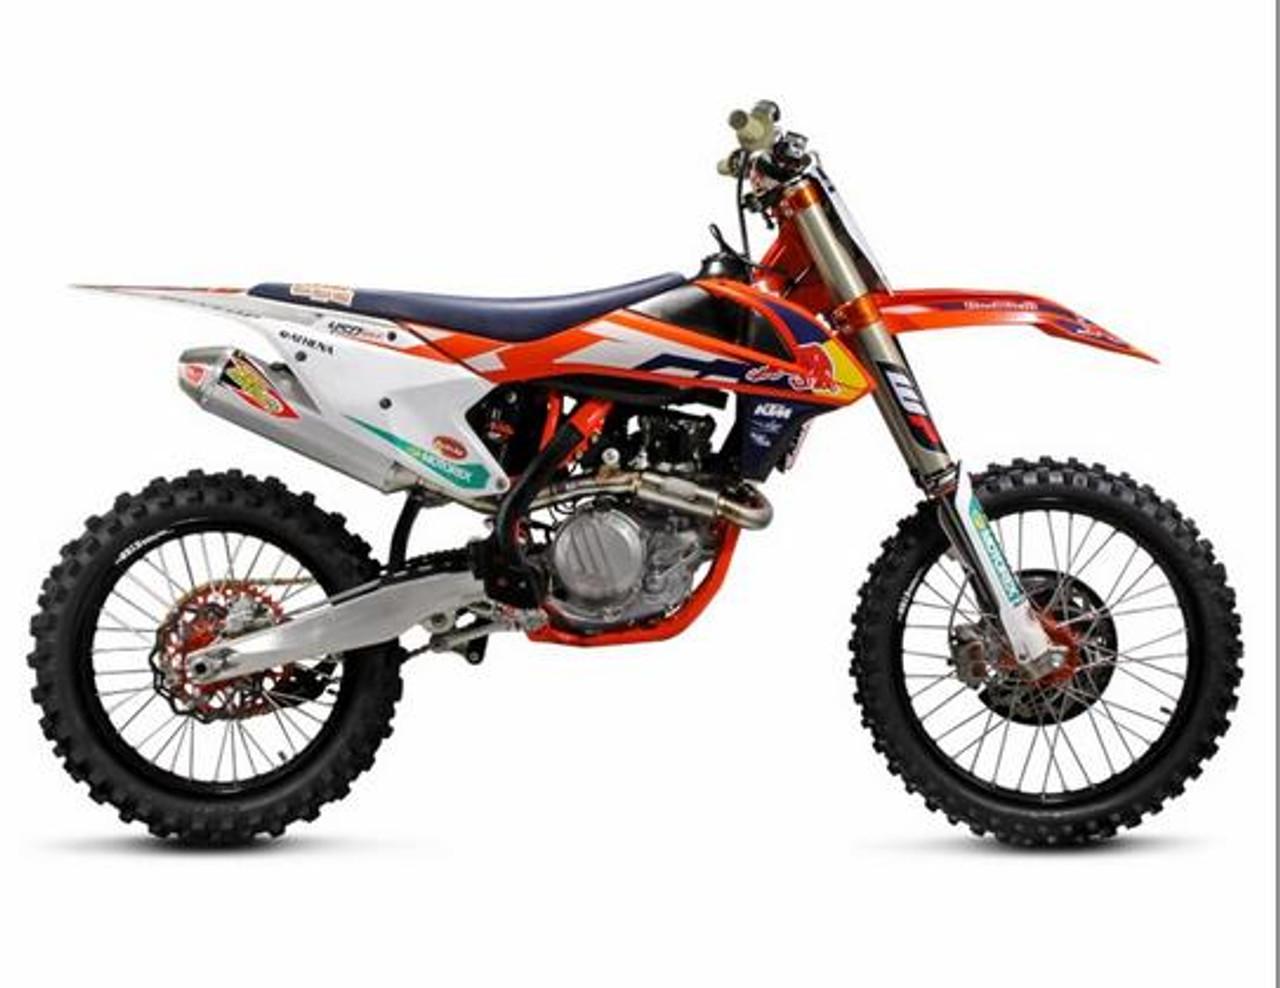 pro circuit 0151545g t6 t 6 full exhaust system ktm 450 sx f xc f 15 16